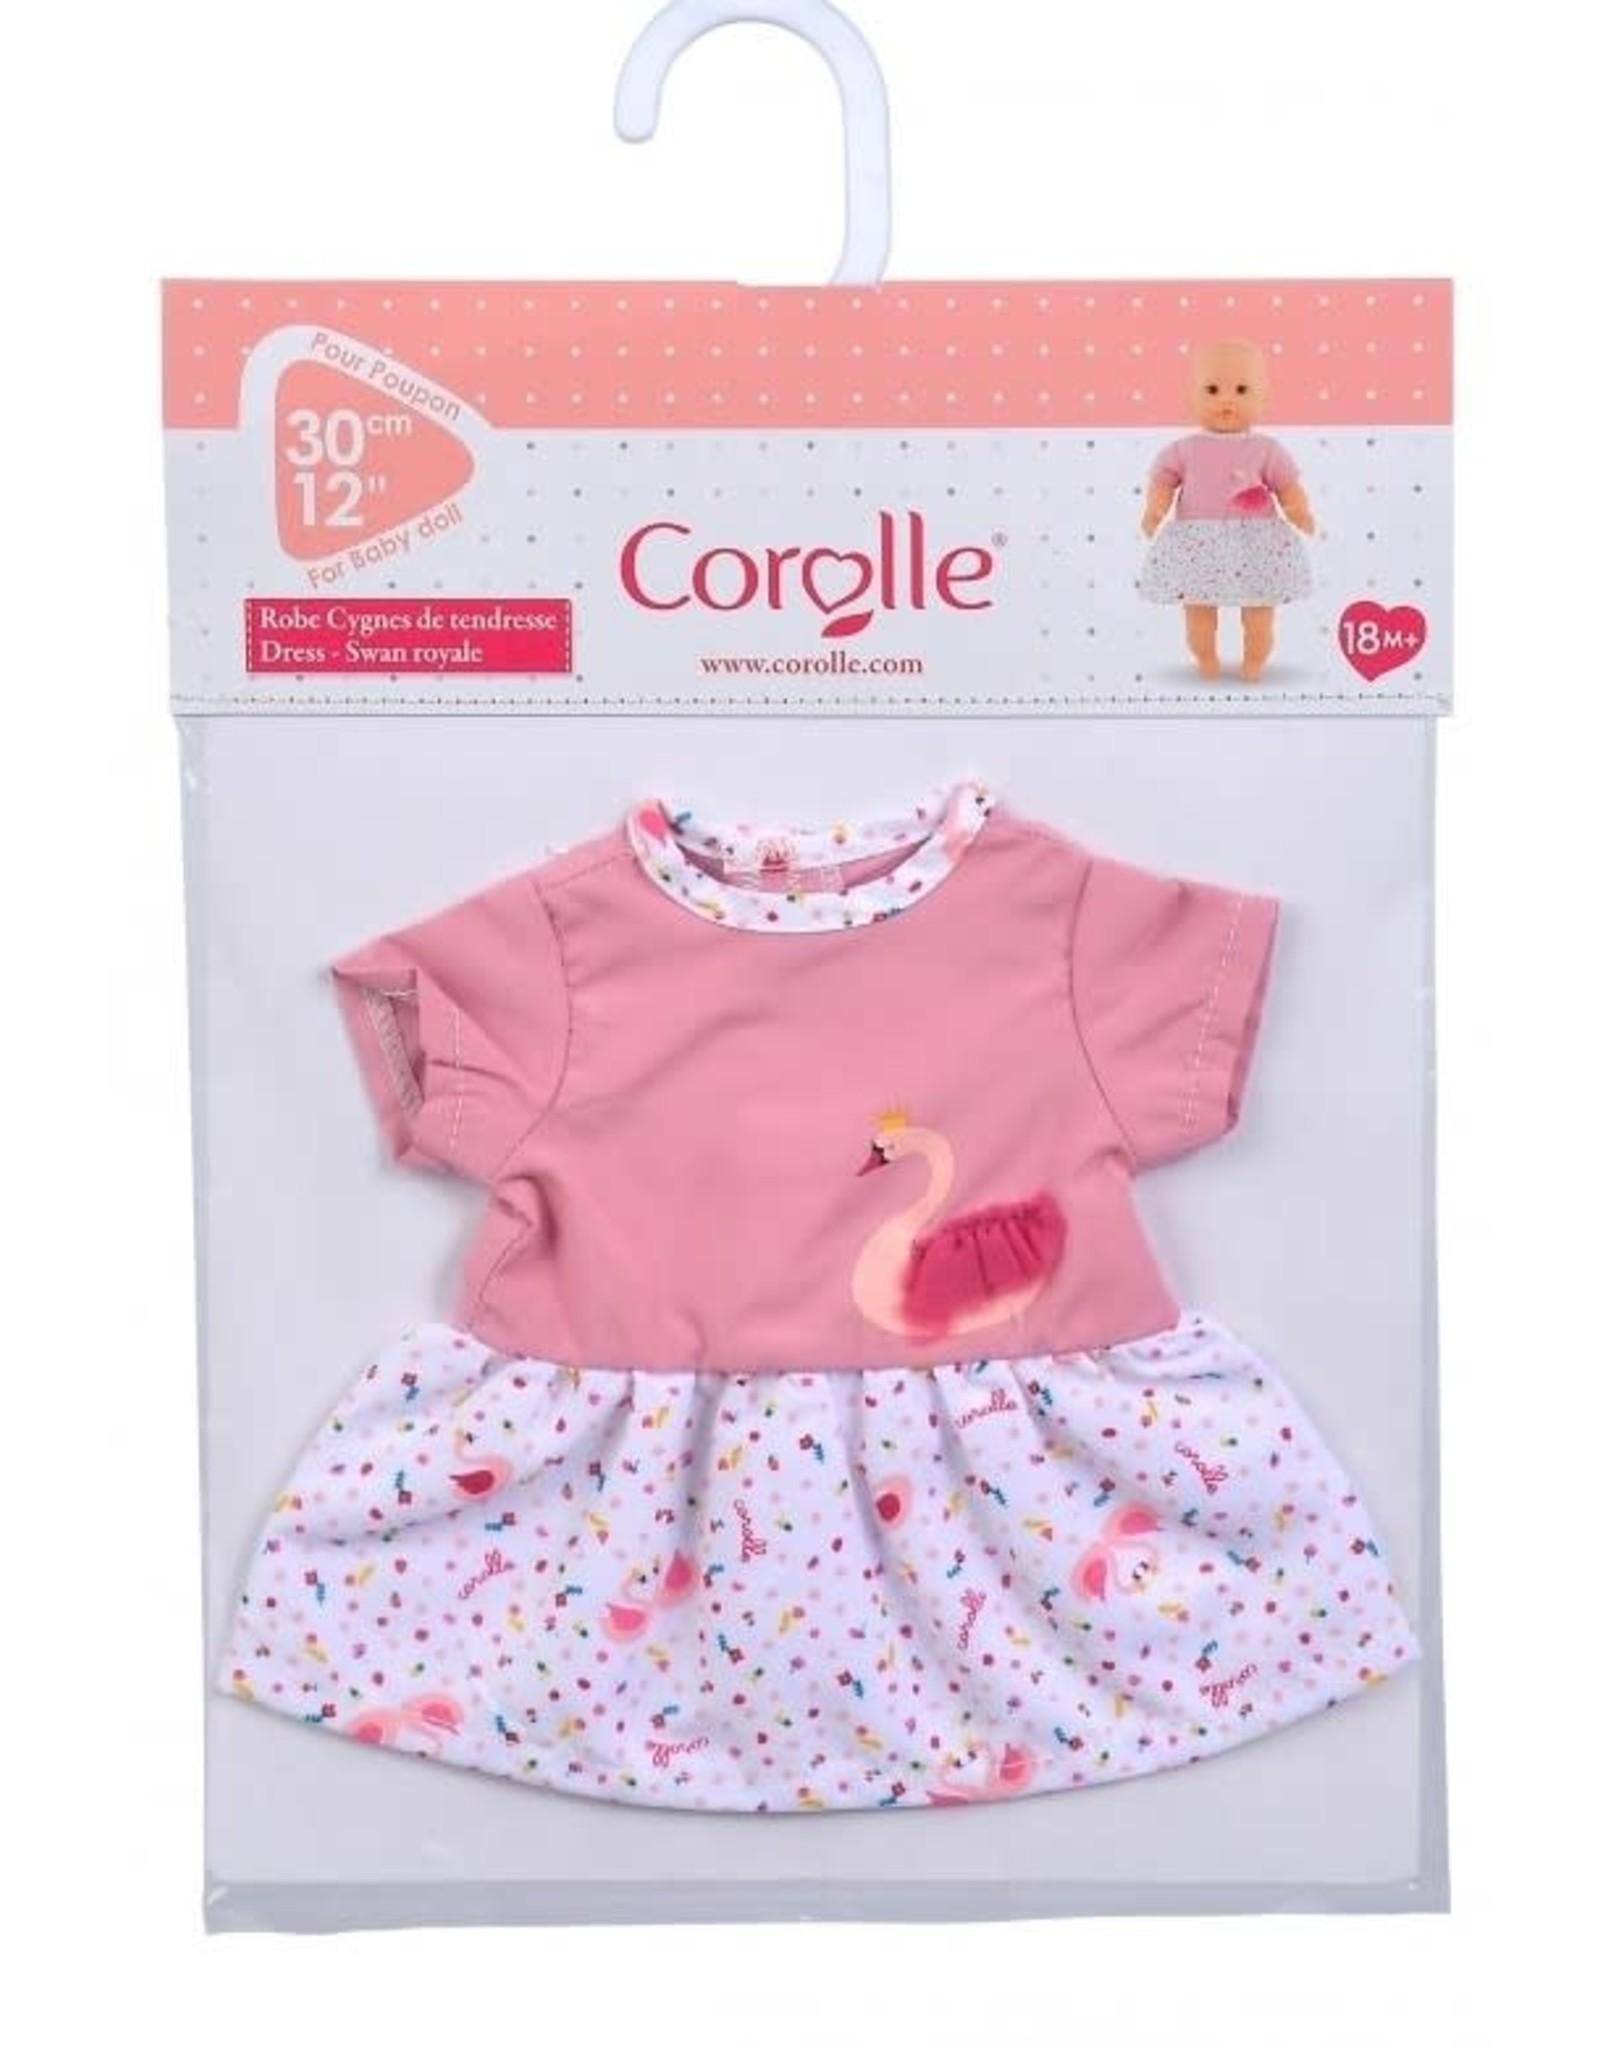 "Corolle 12"" Dress - Swan Royale - NEW"